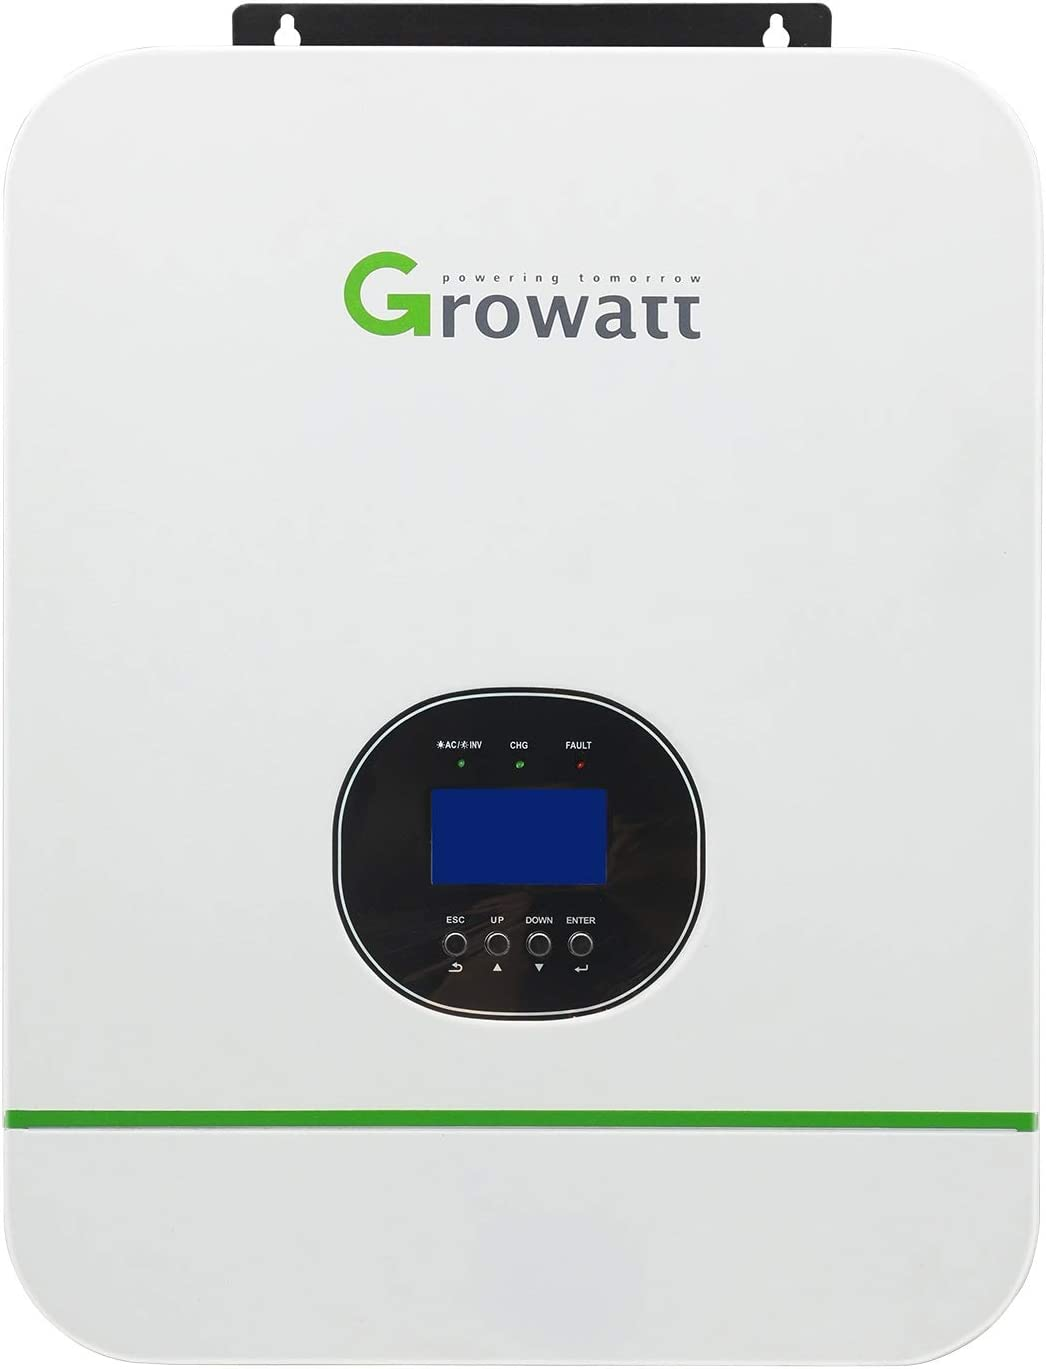 PowMr 3000W Off-Grid Solar Inverter 110V/220V Built-in 80A MPPT Solar Charge Controller, Pure Sine Wave Hybrid Inverter Work with 48V Battery Off Grid Solar Home Use